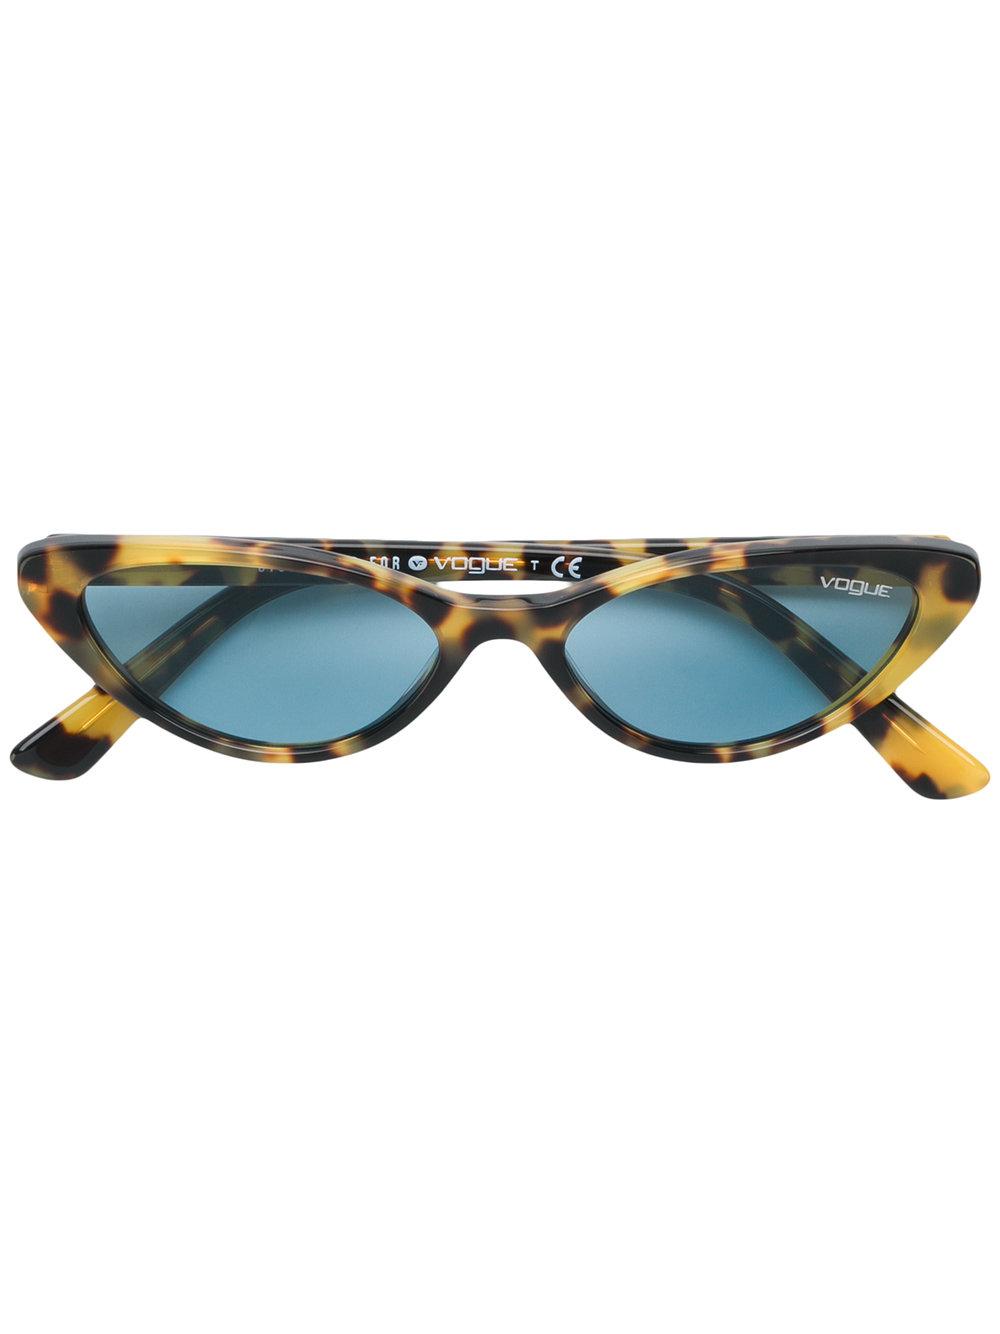 narrow sunglasses narrow rectangular sunglasses small sunglasses trend 90s sunglasses where to buy tiny sunglasses tiny 90s sunglasses narrow frame sunglasses tiny sunglasses trend